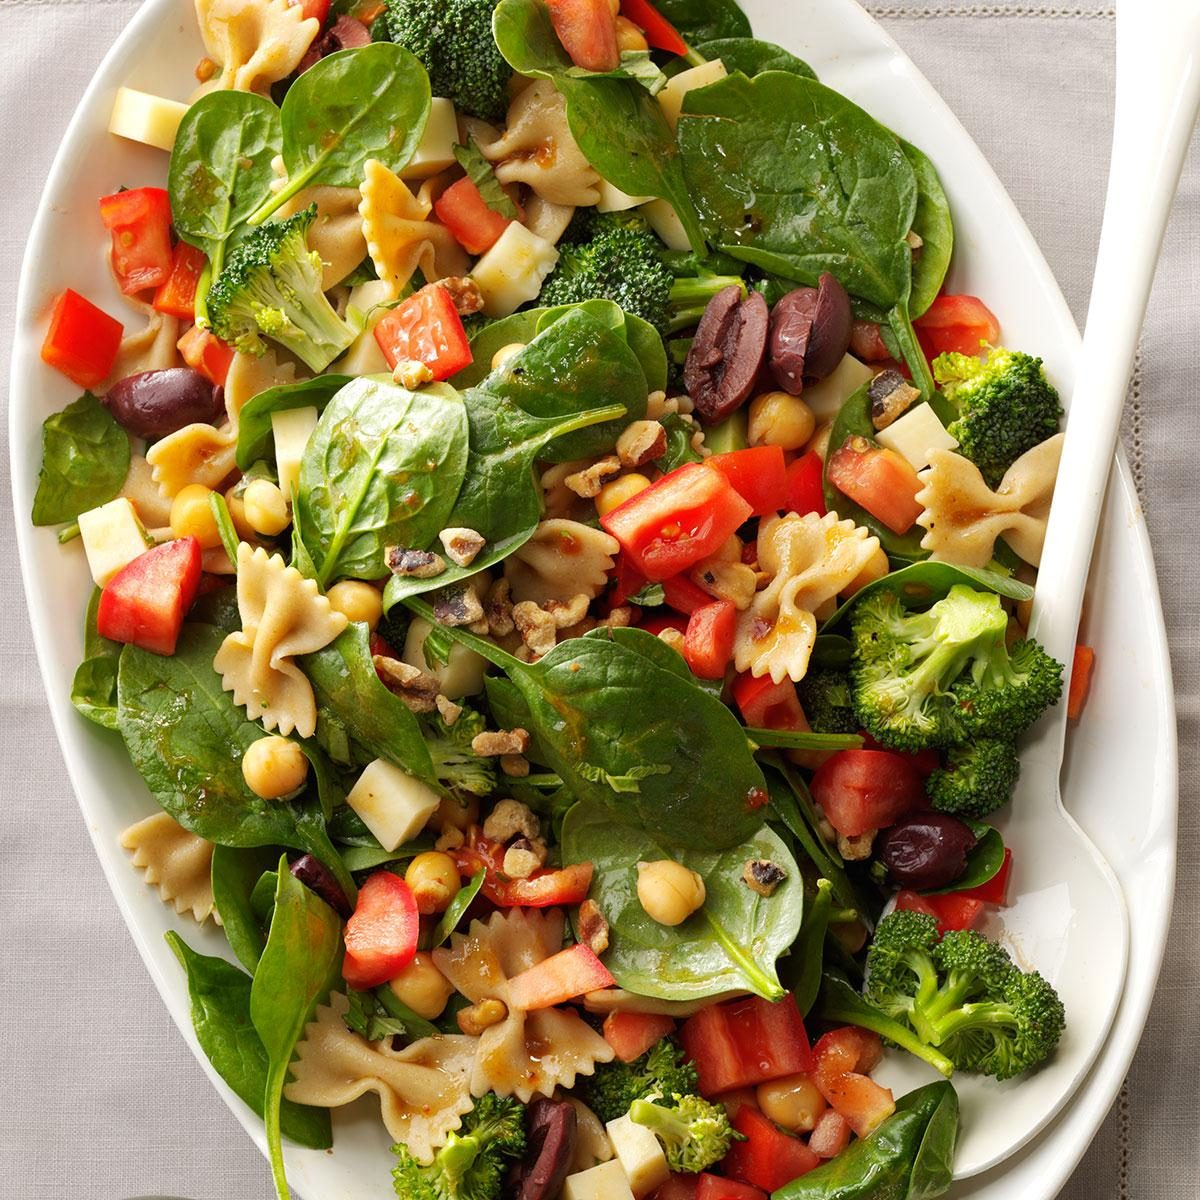 Montana: Bow Tie & Spinach Salad